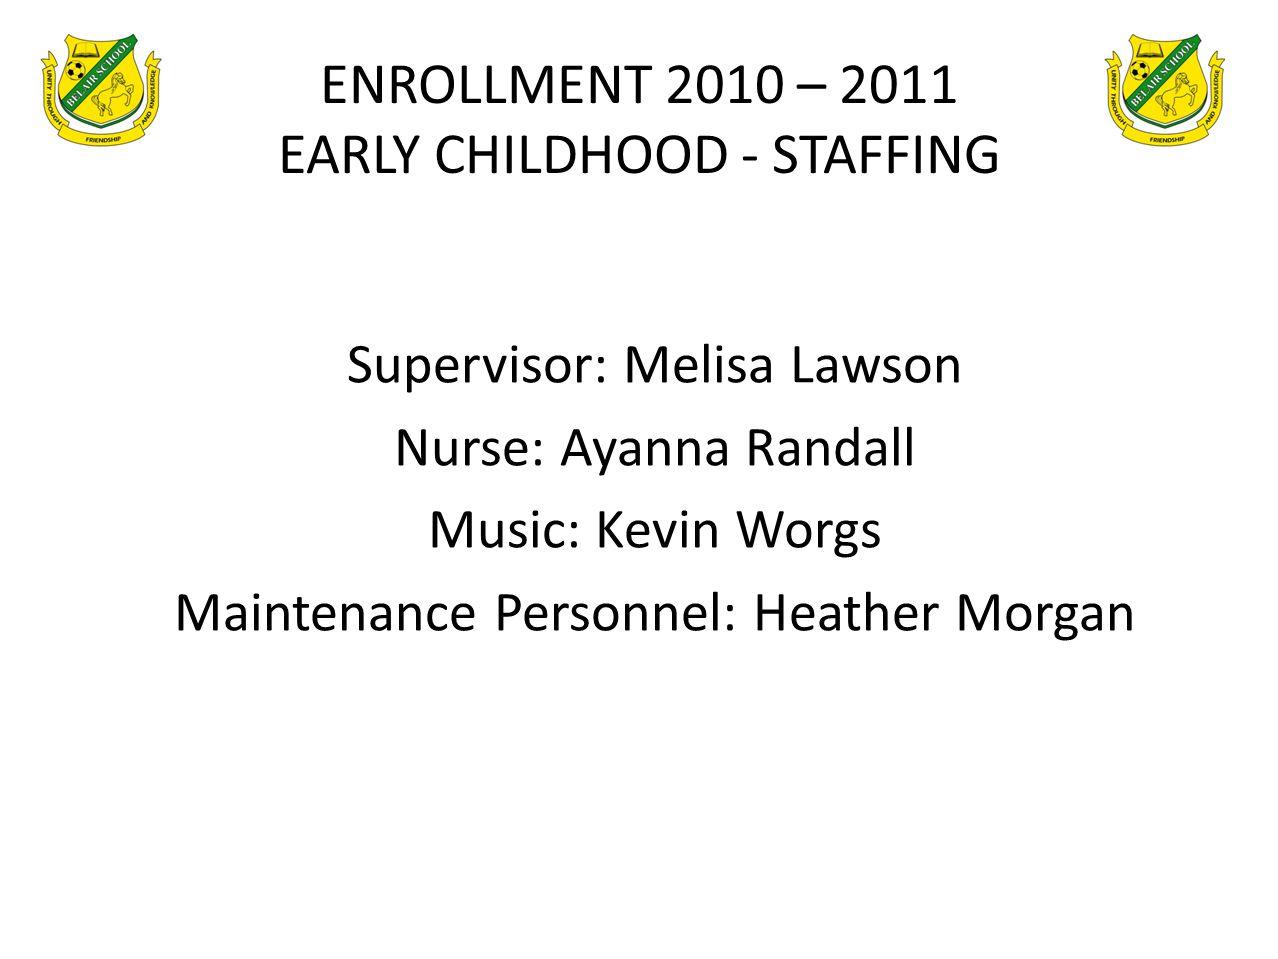 ENROLLMENT 2010 – 2011 EARLY CHILDHOOD - STAFFING